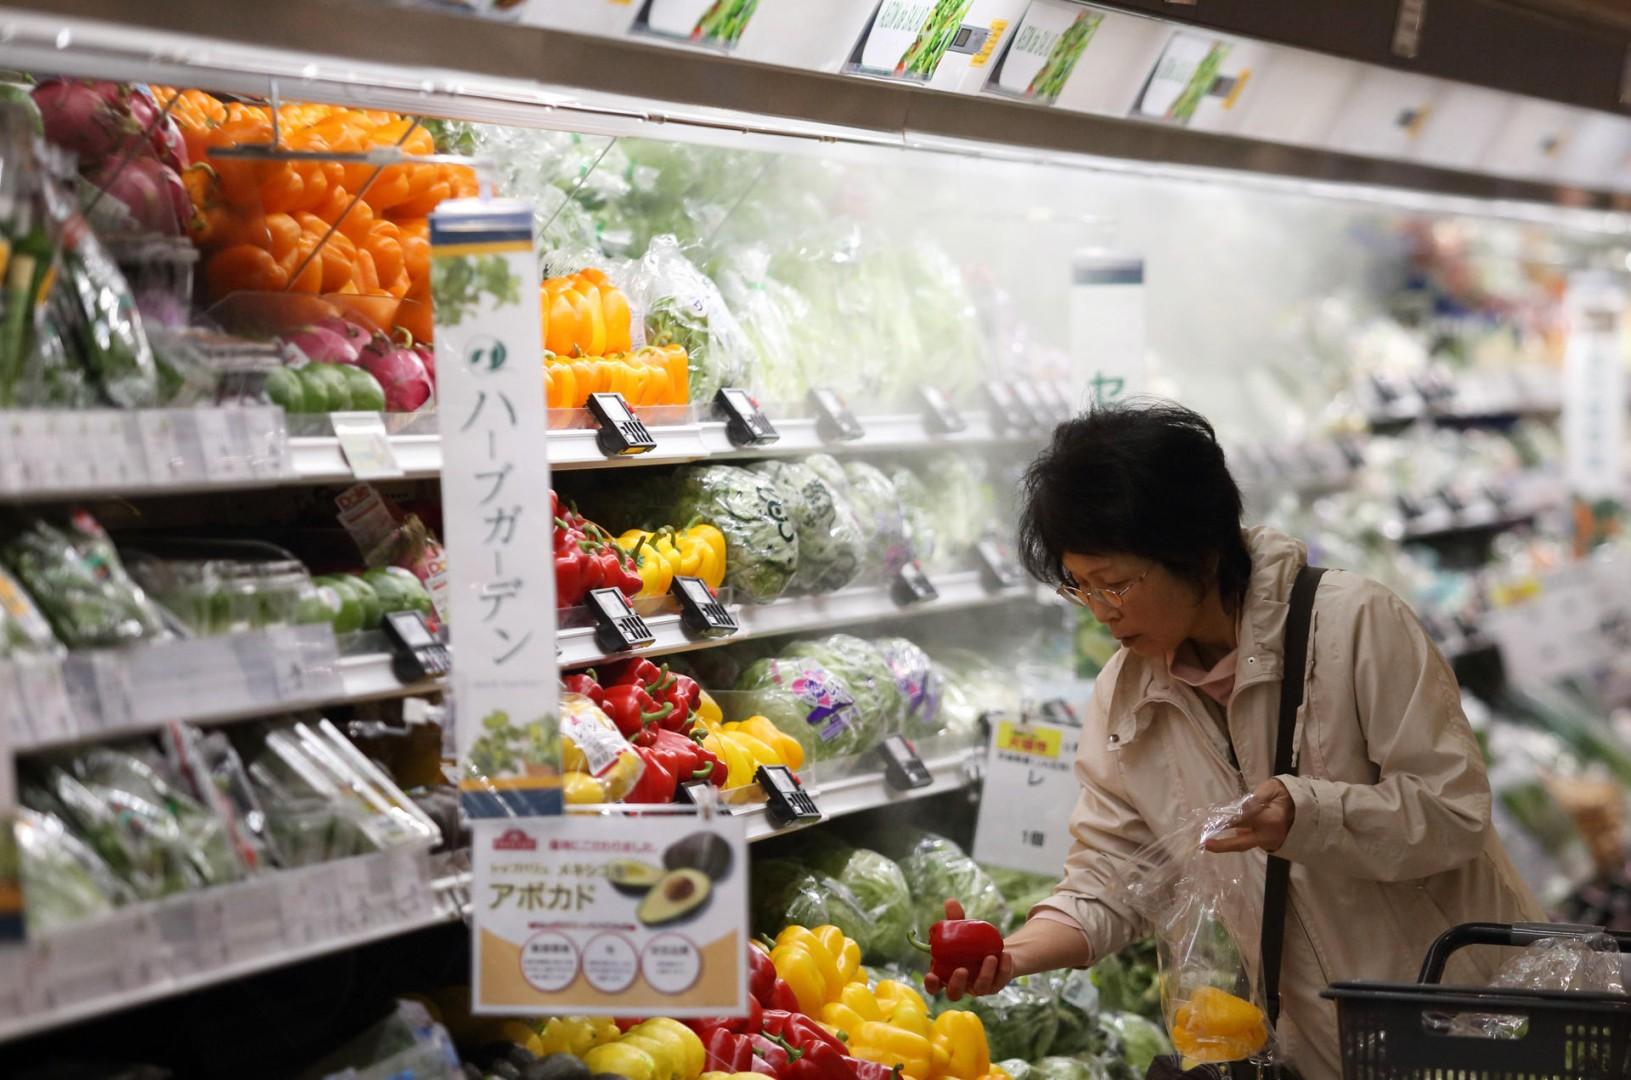 115 Japanese stores sharing customers' facial data | South